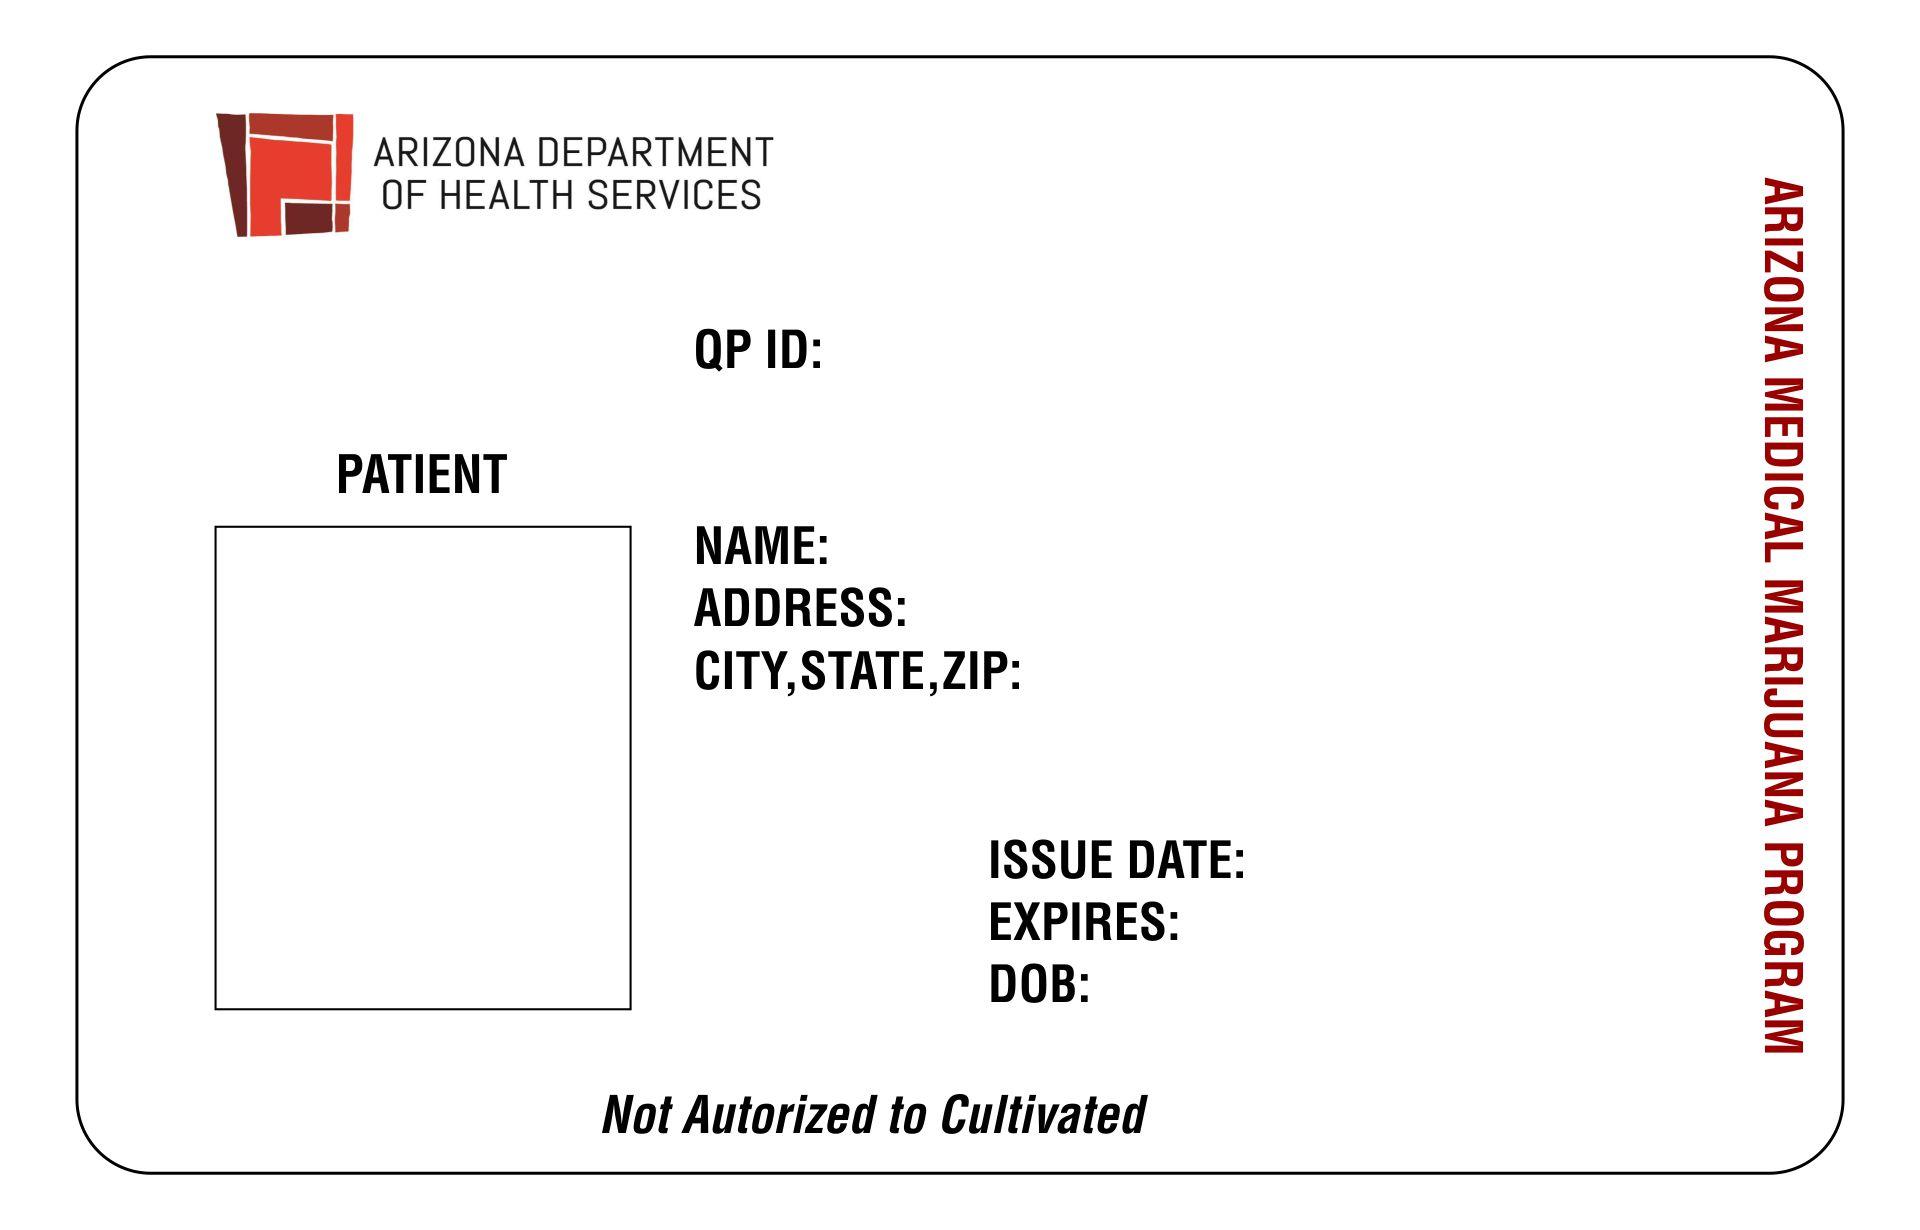 Printable Medical Cards In Arizona